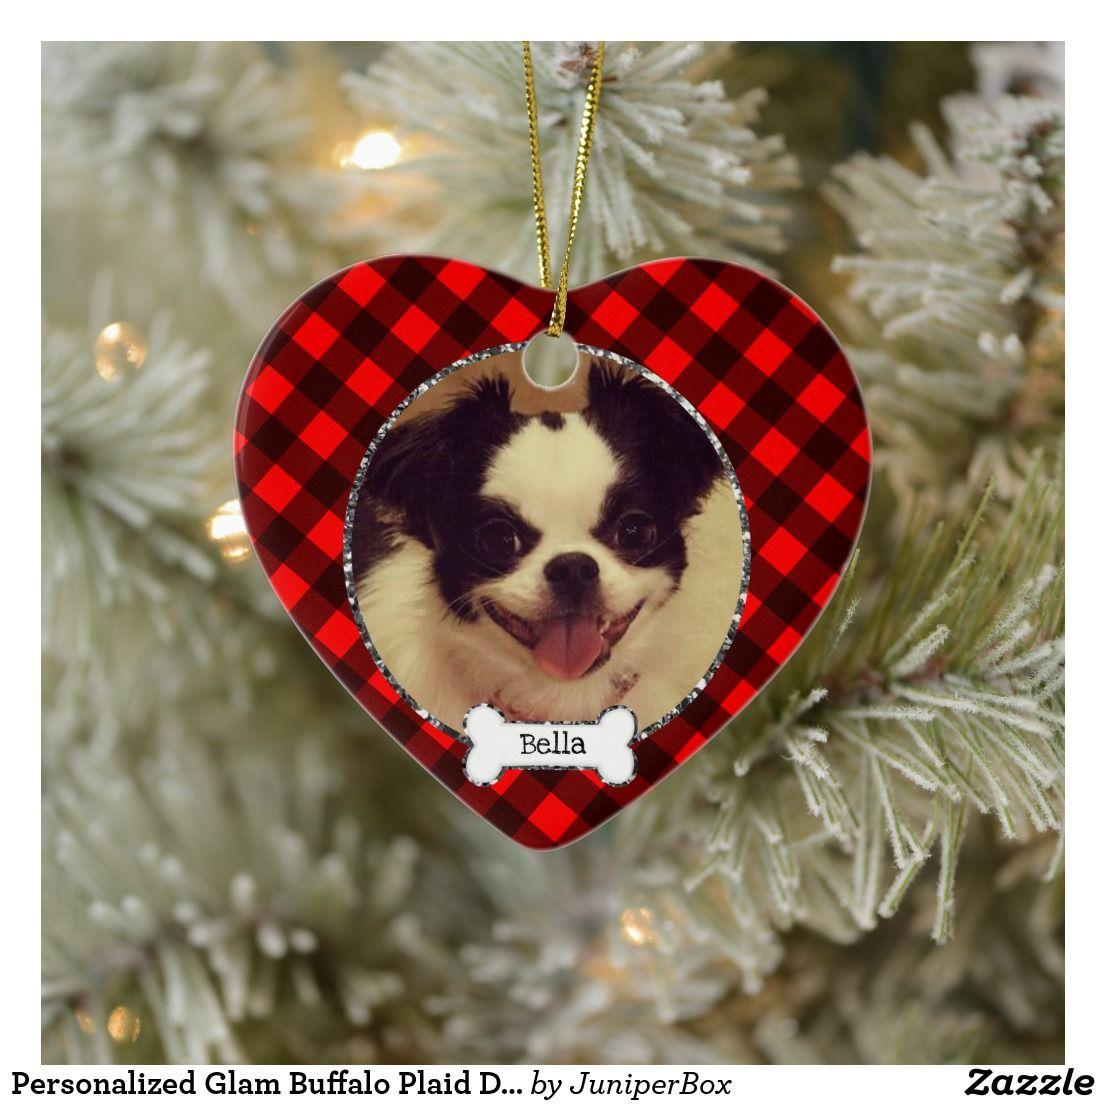 Personalized Glam Buffalo Plaid Dog Photo Ornament